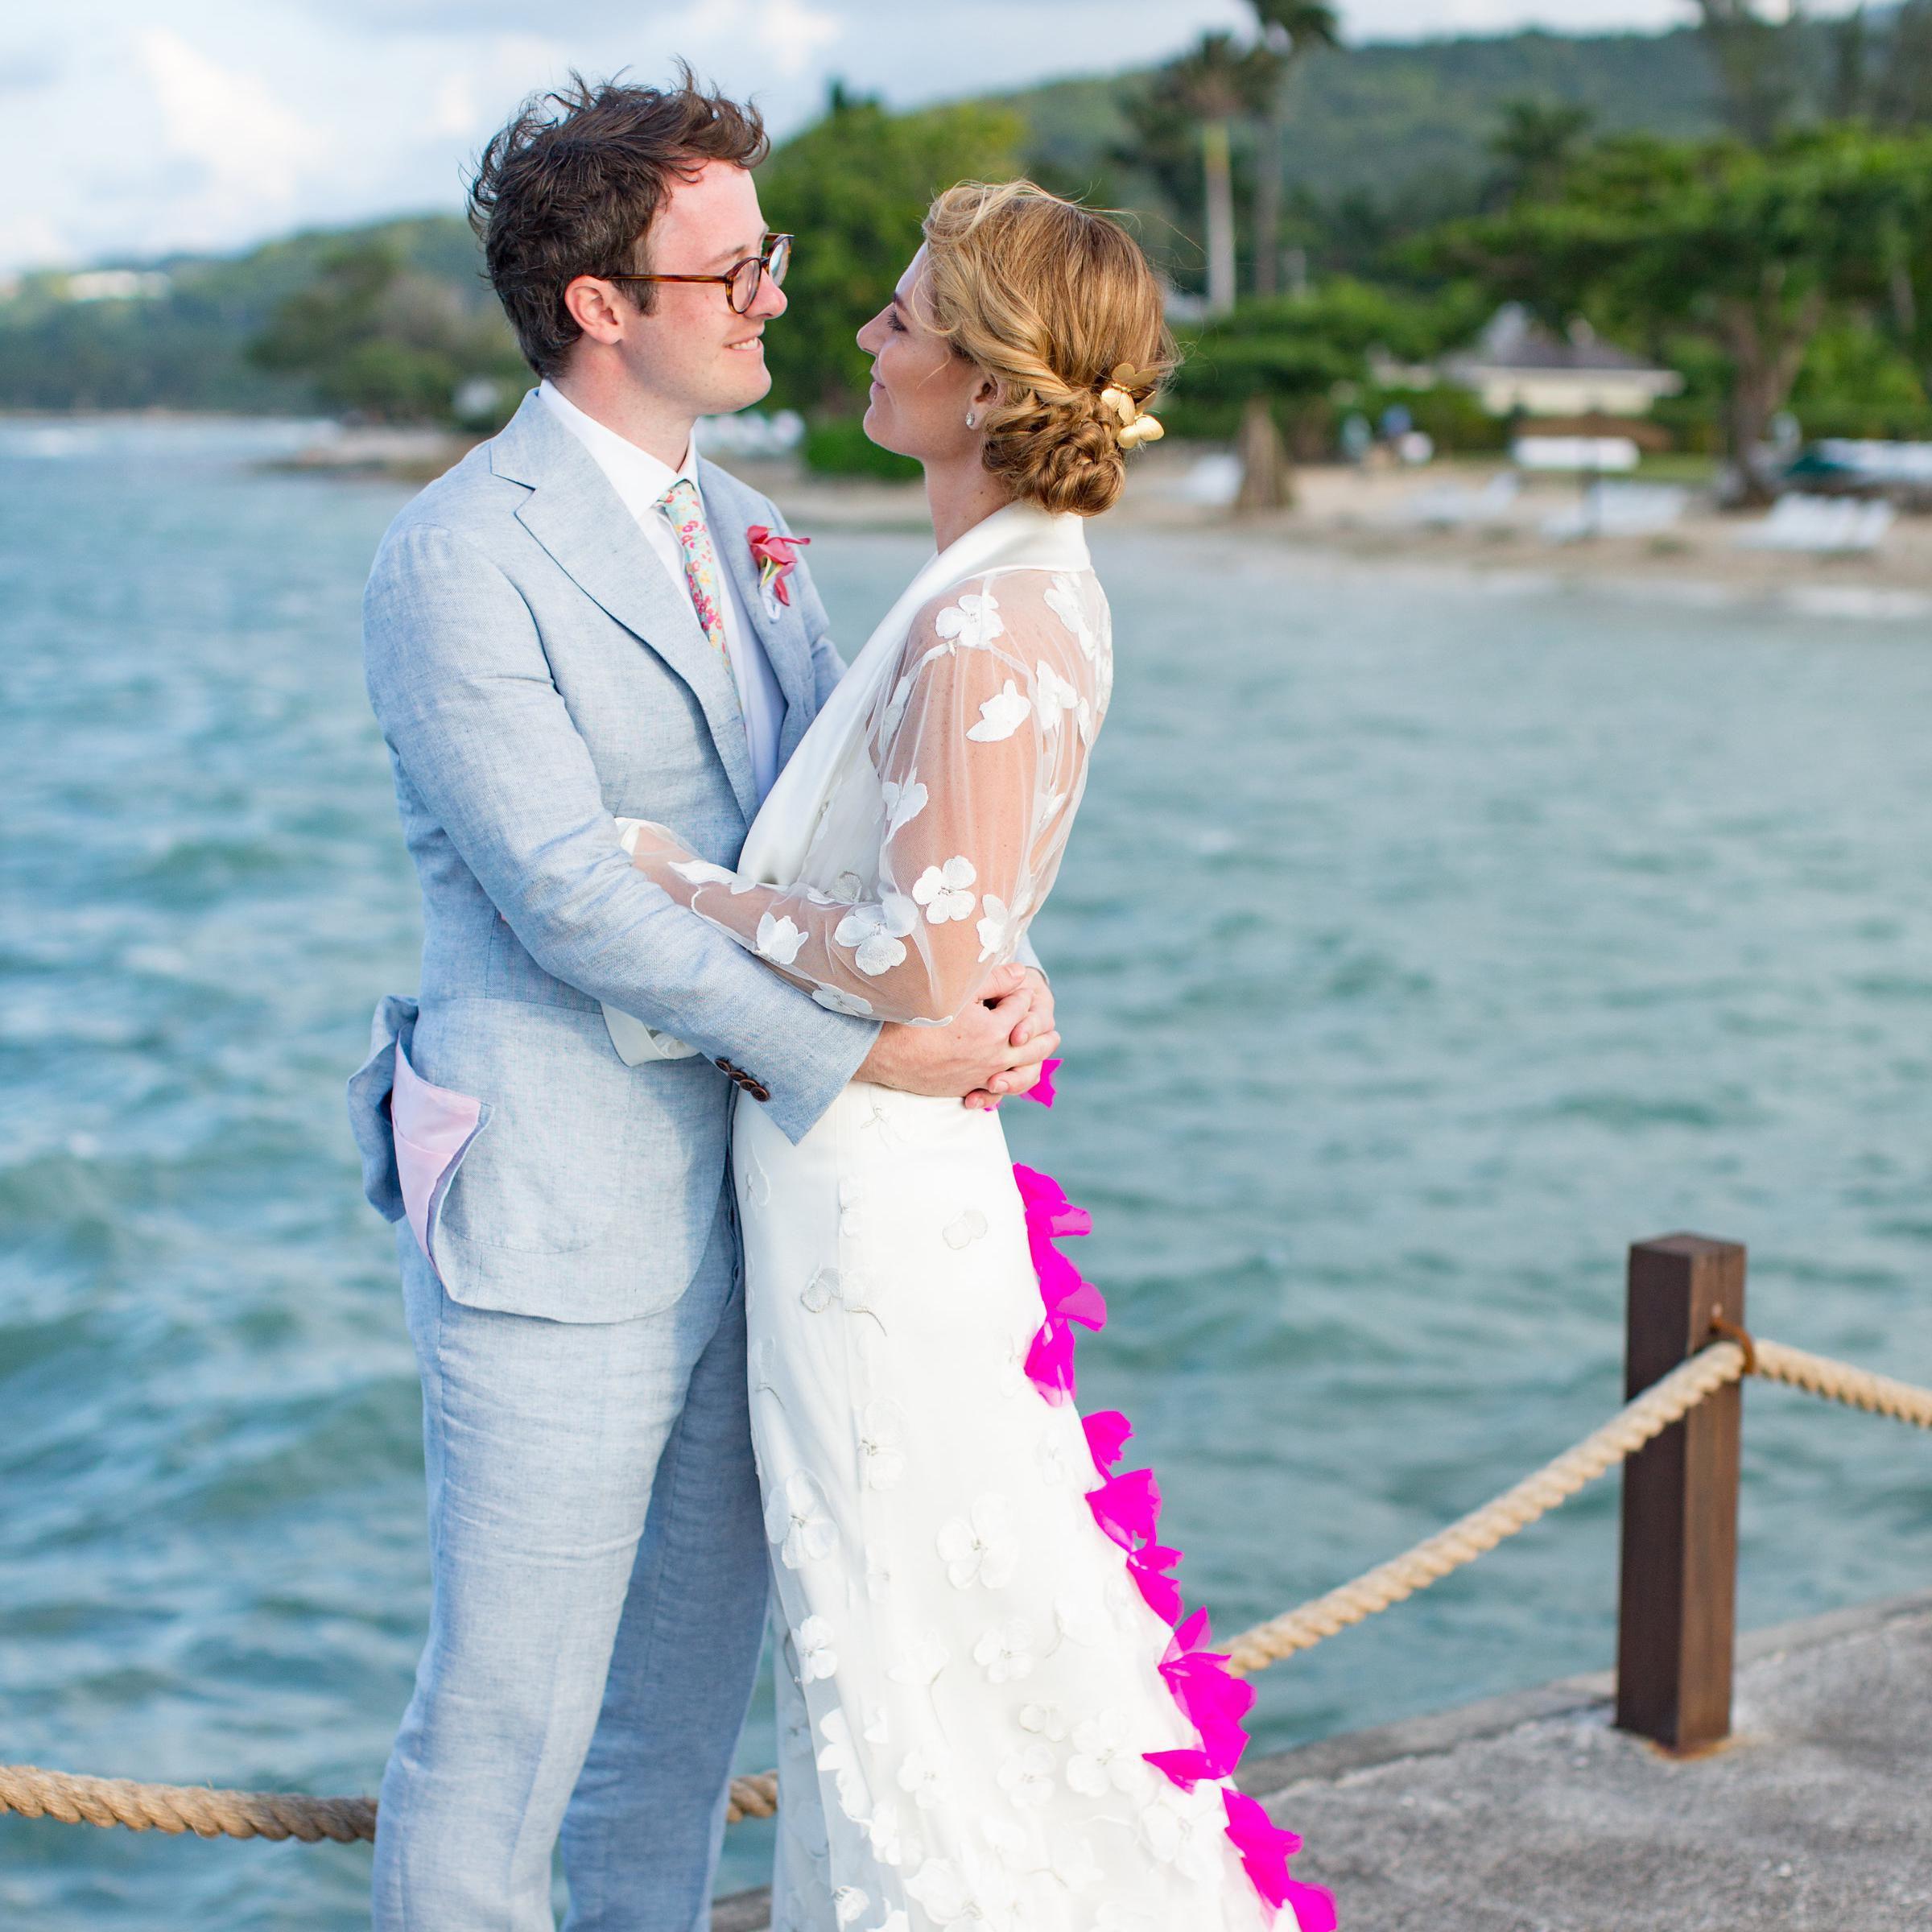 Elizabeth Fillmore Orchid Wedding Dress New Size 6 840